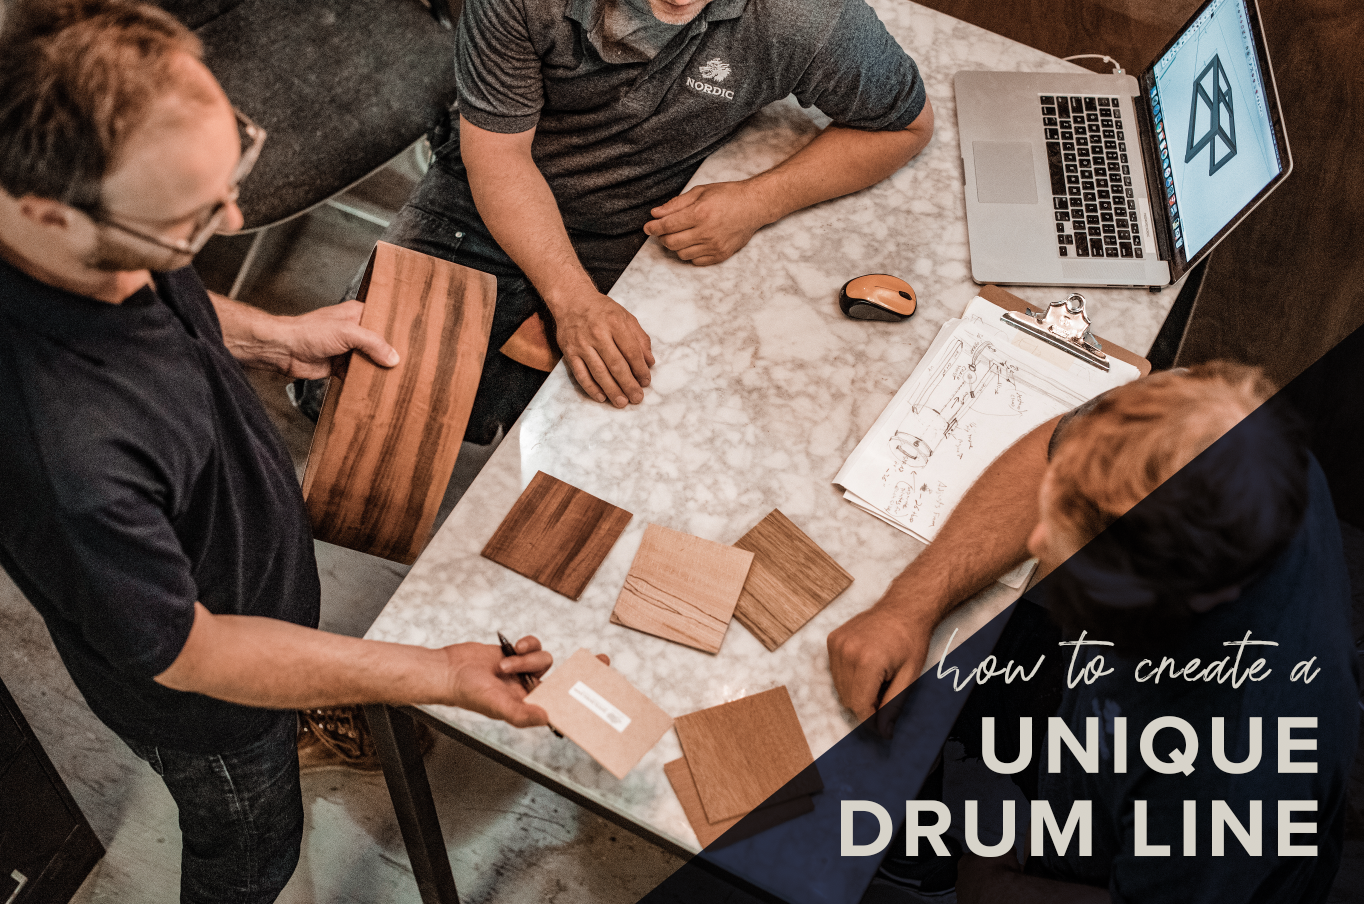 Create a Unique Drum Line